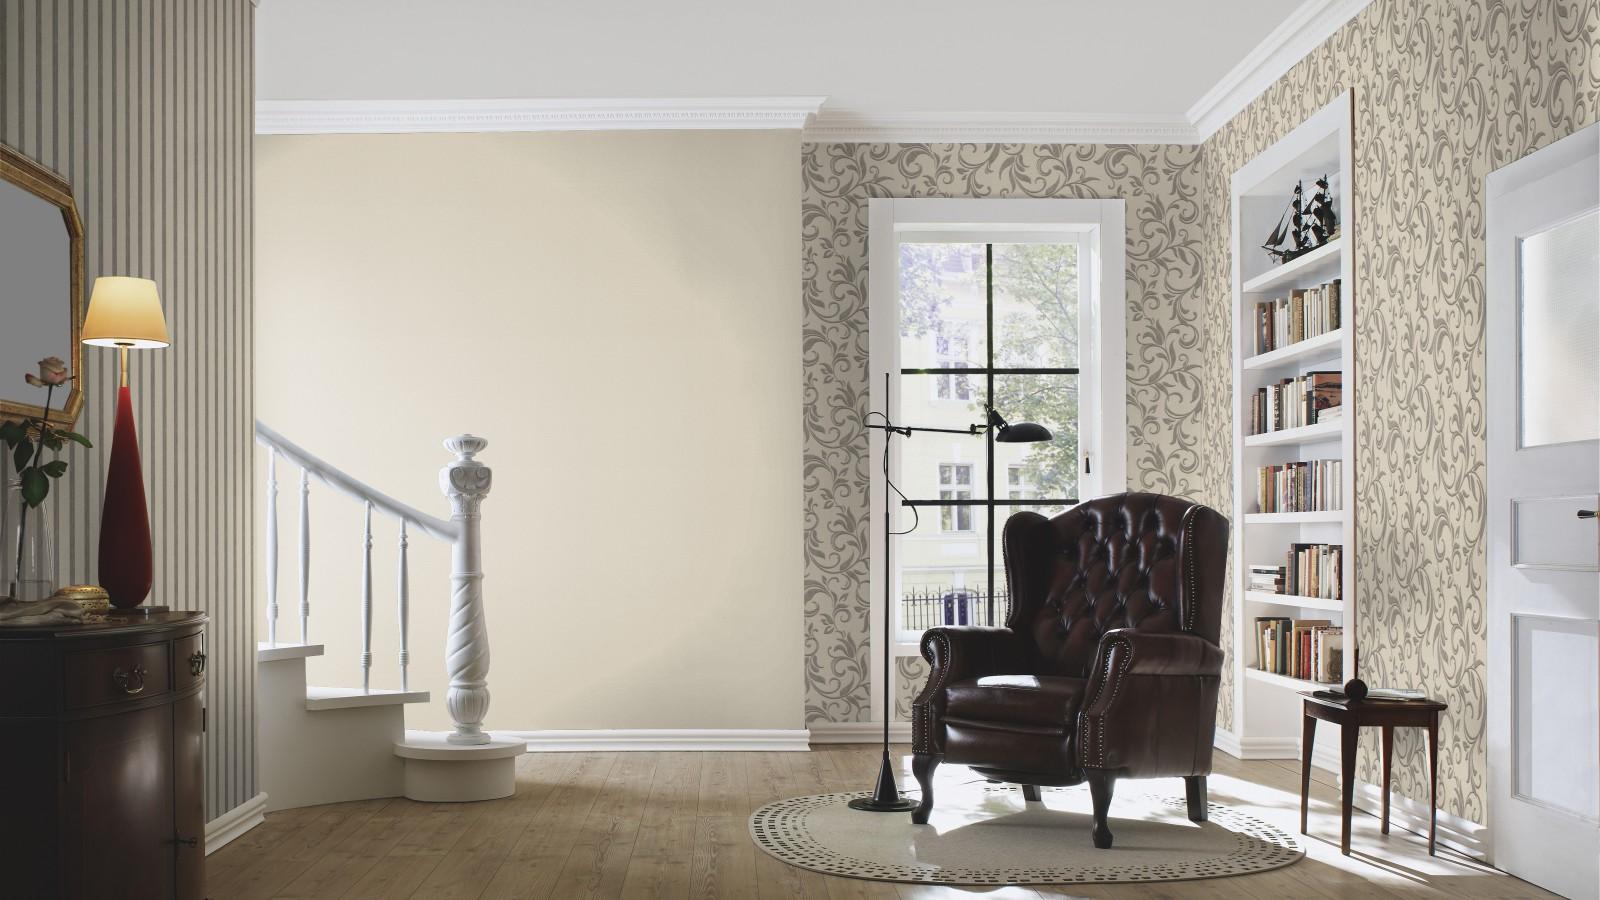 rasch tapete beige grau ranken home vision 732504 - Tapete Grau Beige